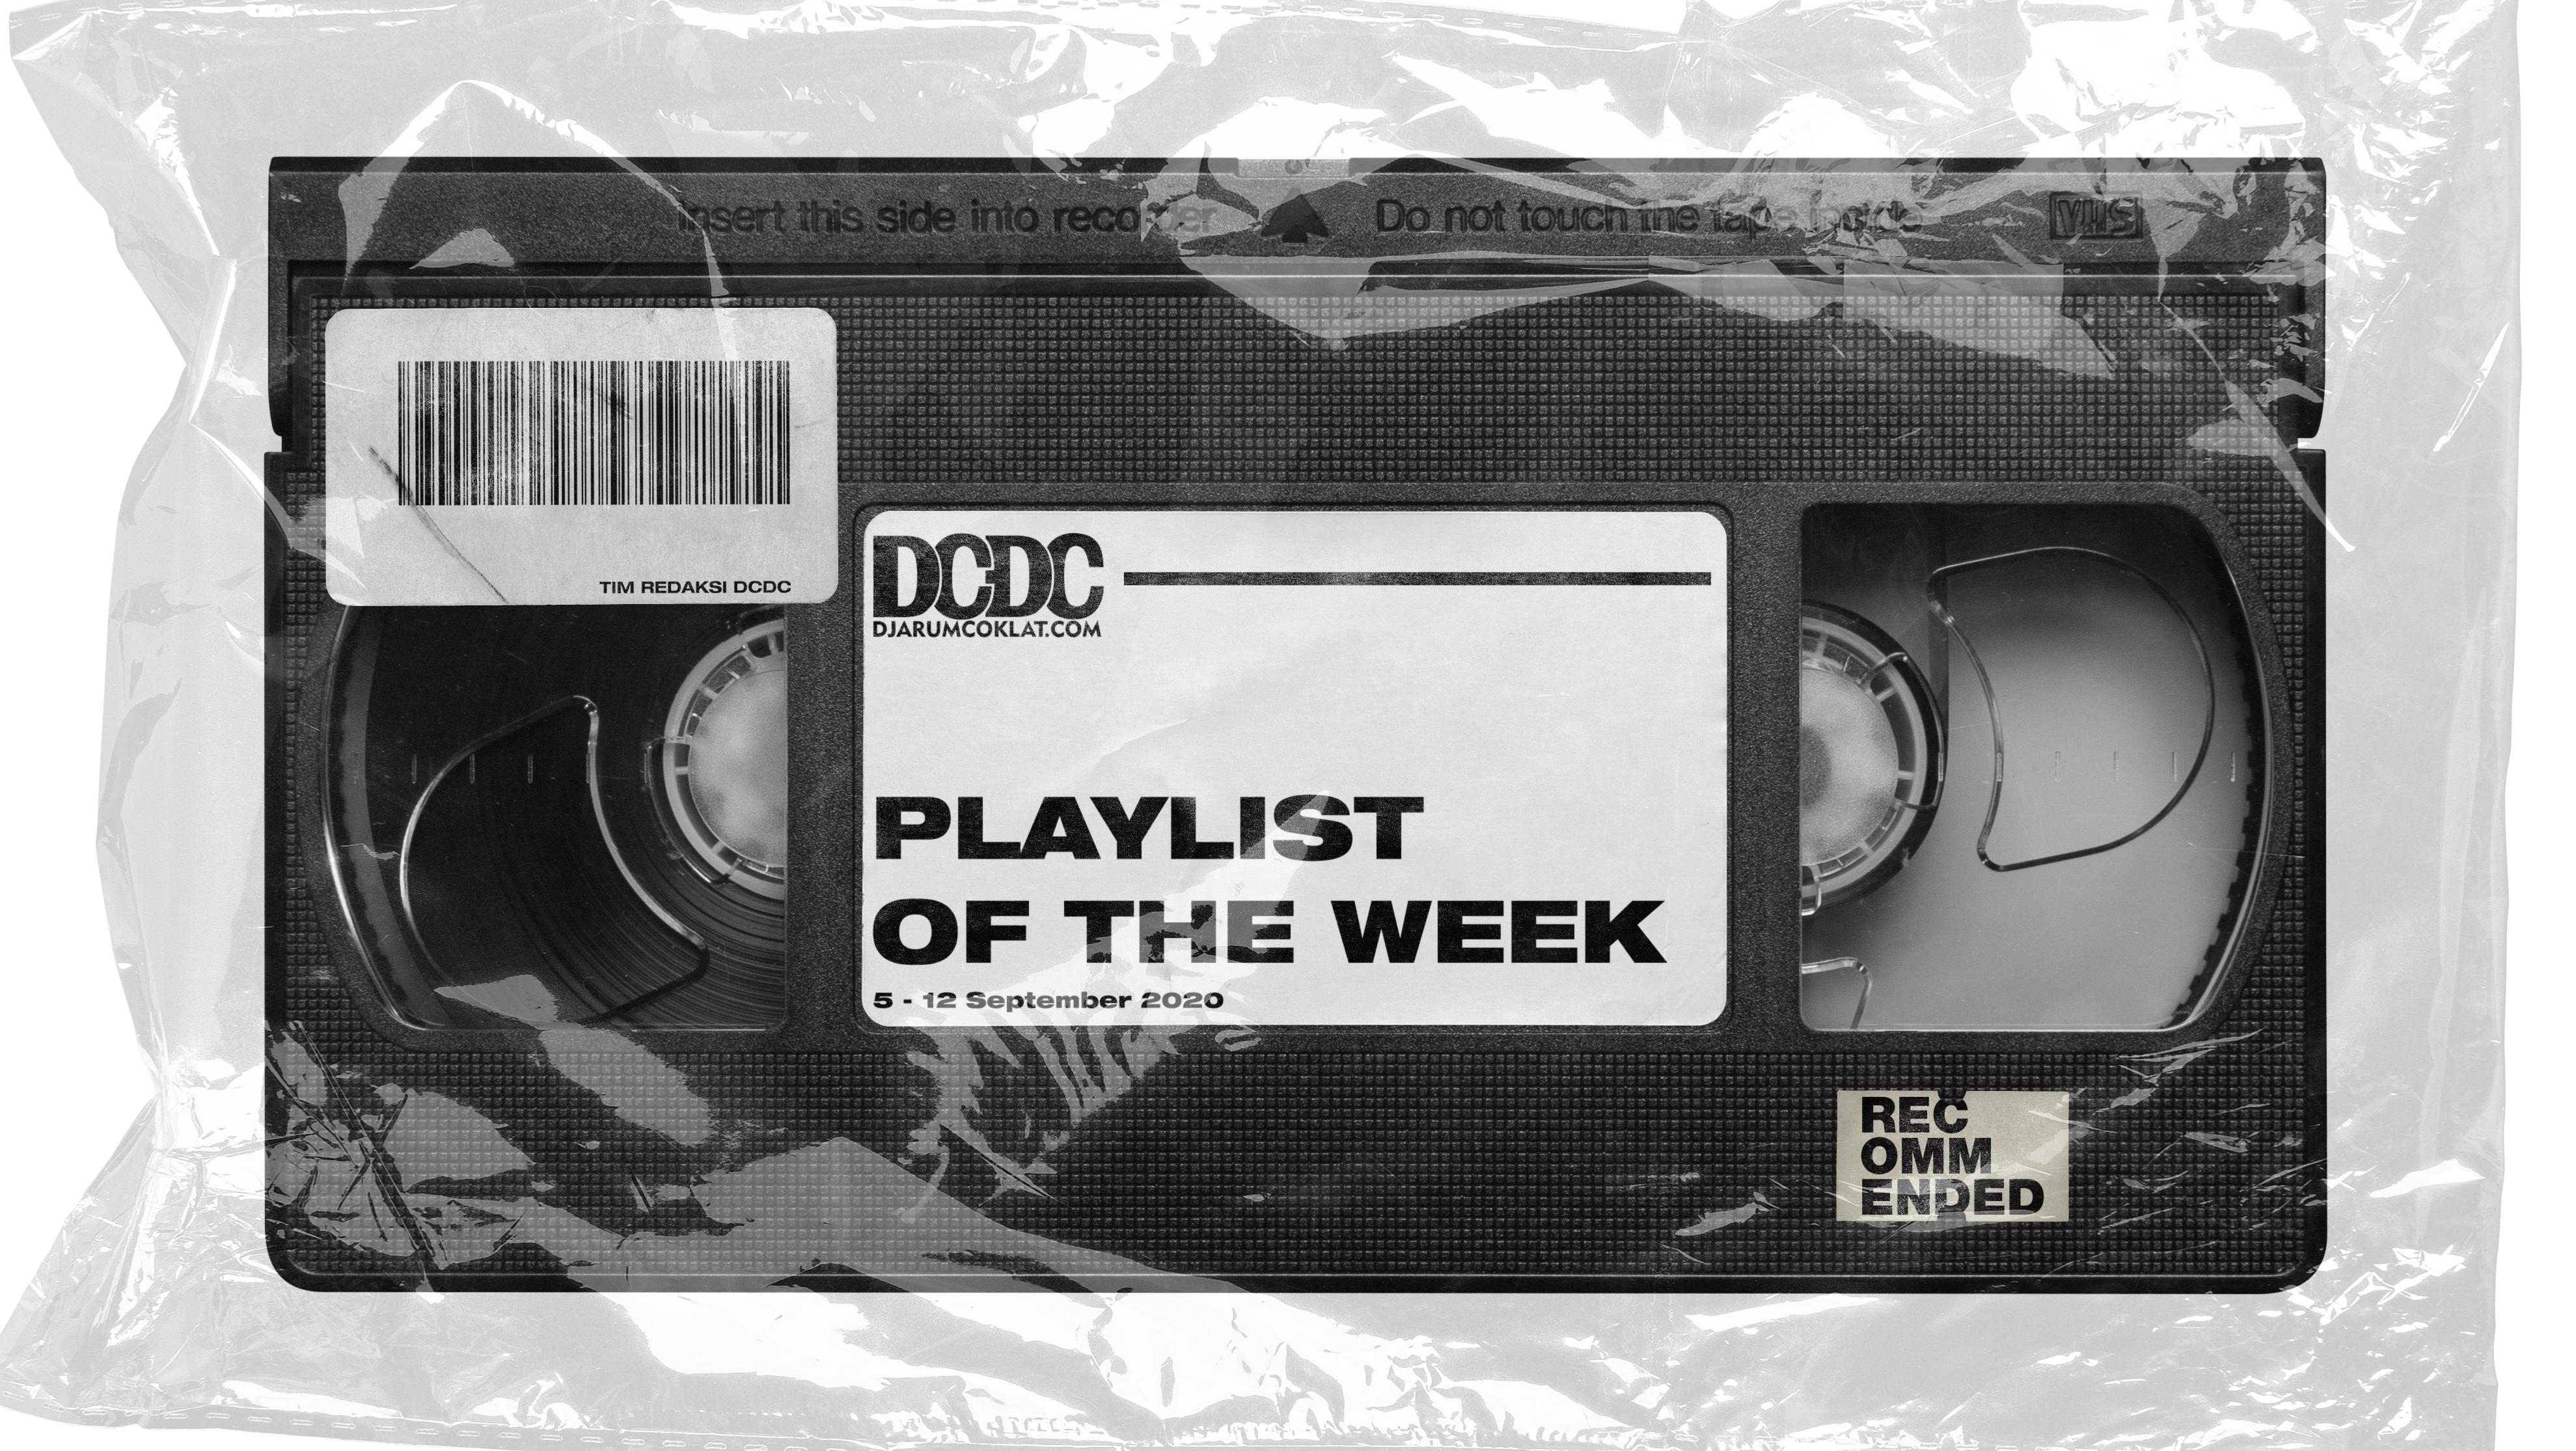 Playlist Of The Week (05 - 12 September 2020)